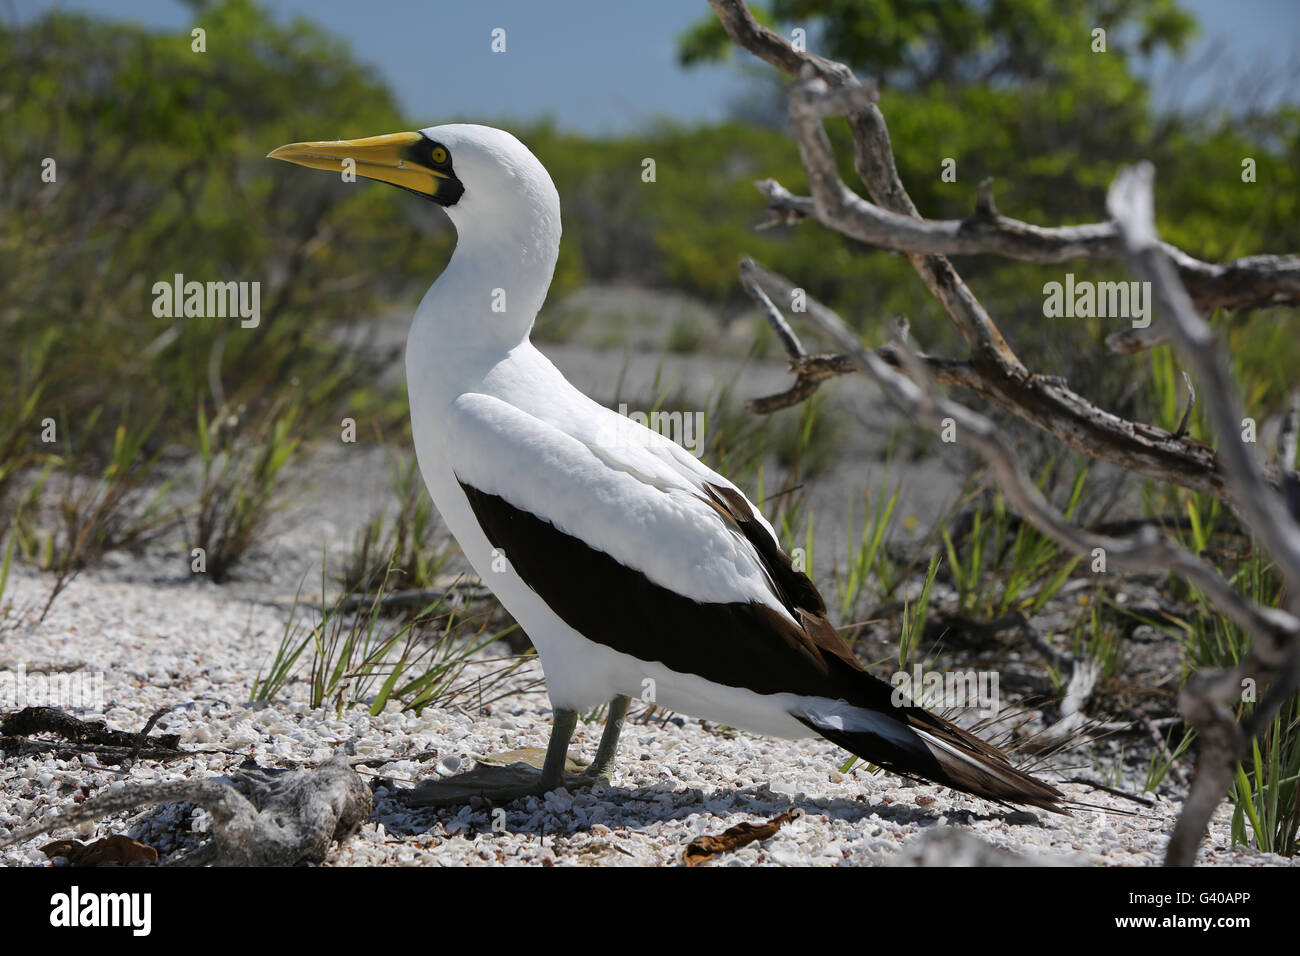 Masked booby bird, Christmas Island, Kiribati - Stock Image